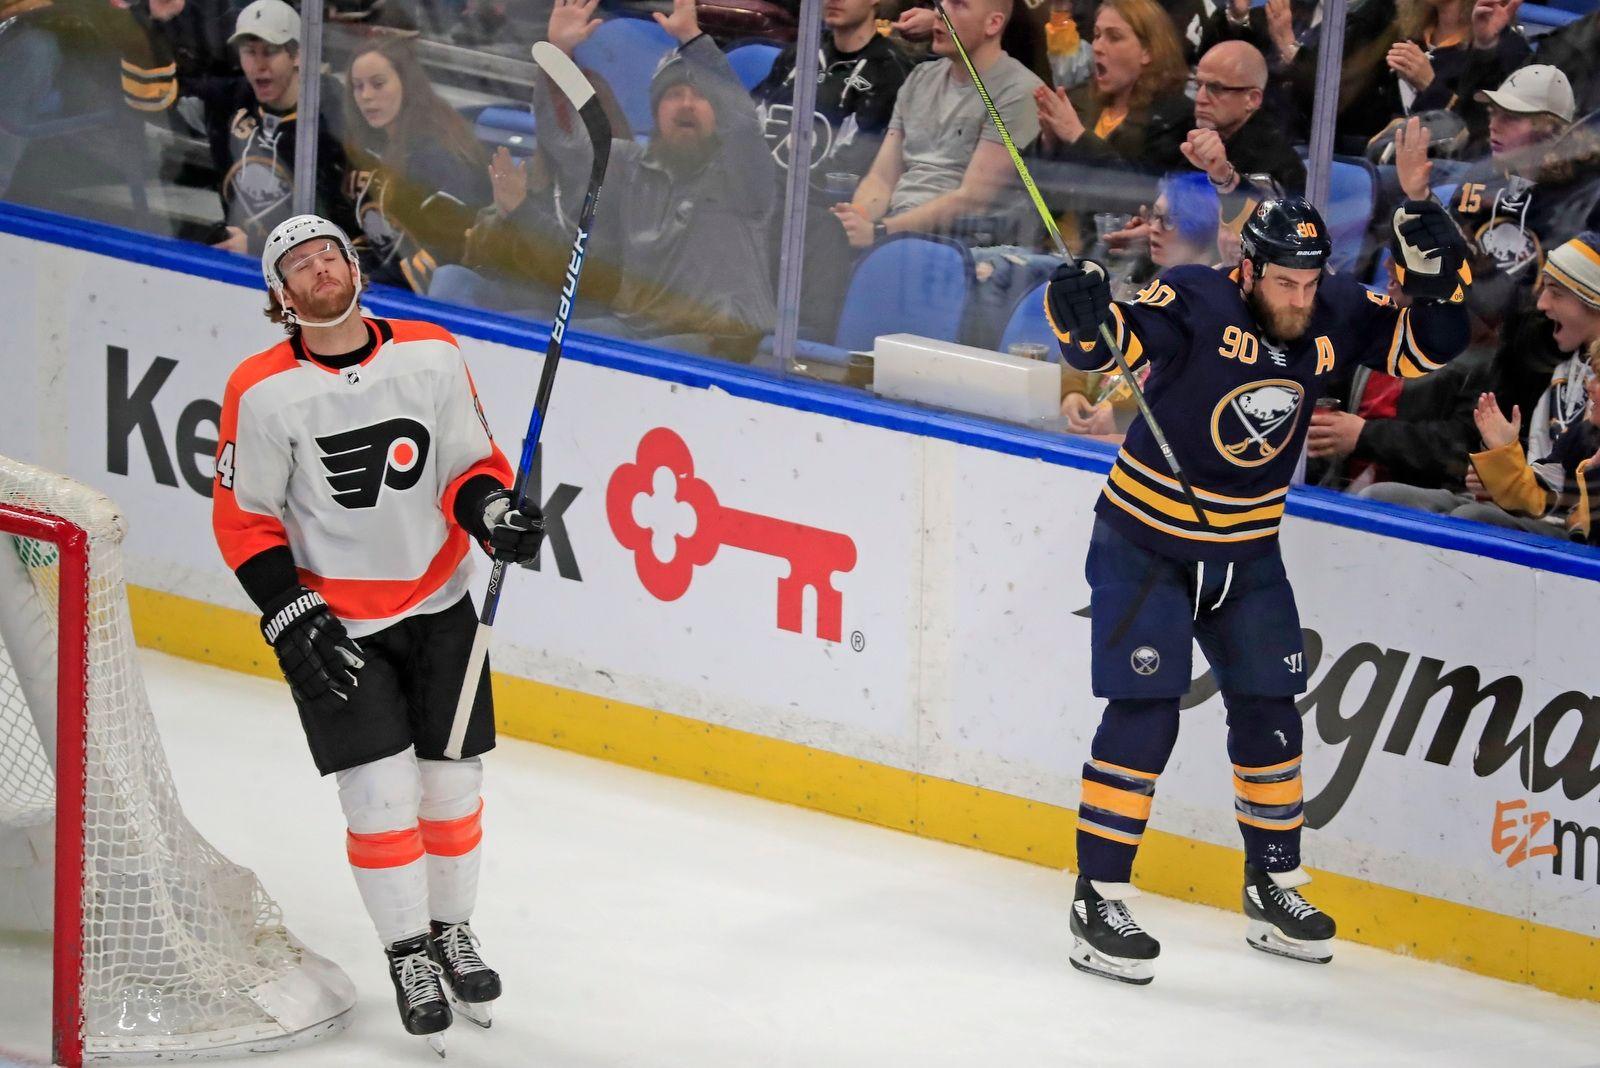 Buffalo Sabres' Ryan Ou2019Reilly celebrates a goal against the Philadelphia Flyers during third period action.